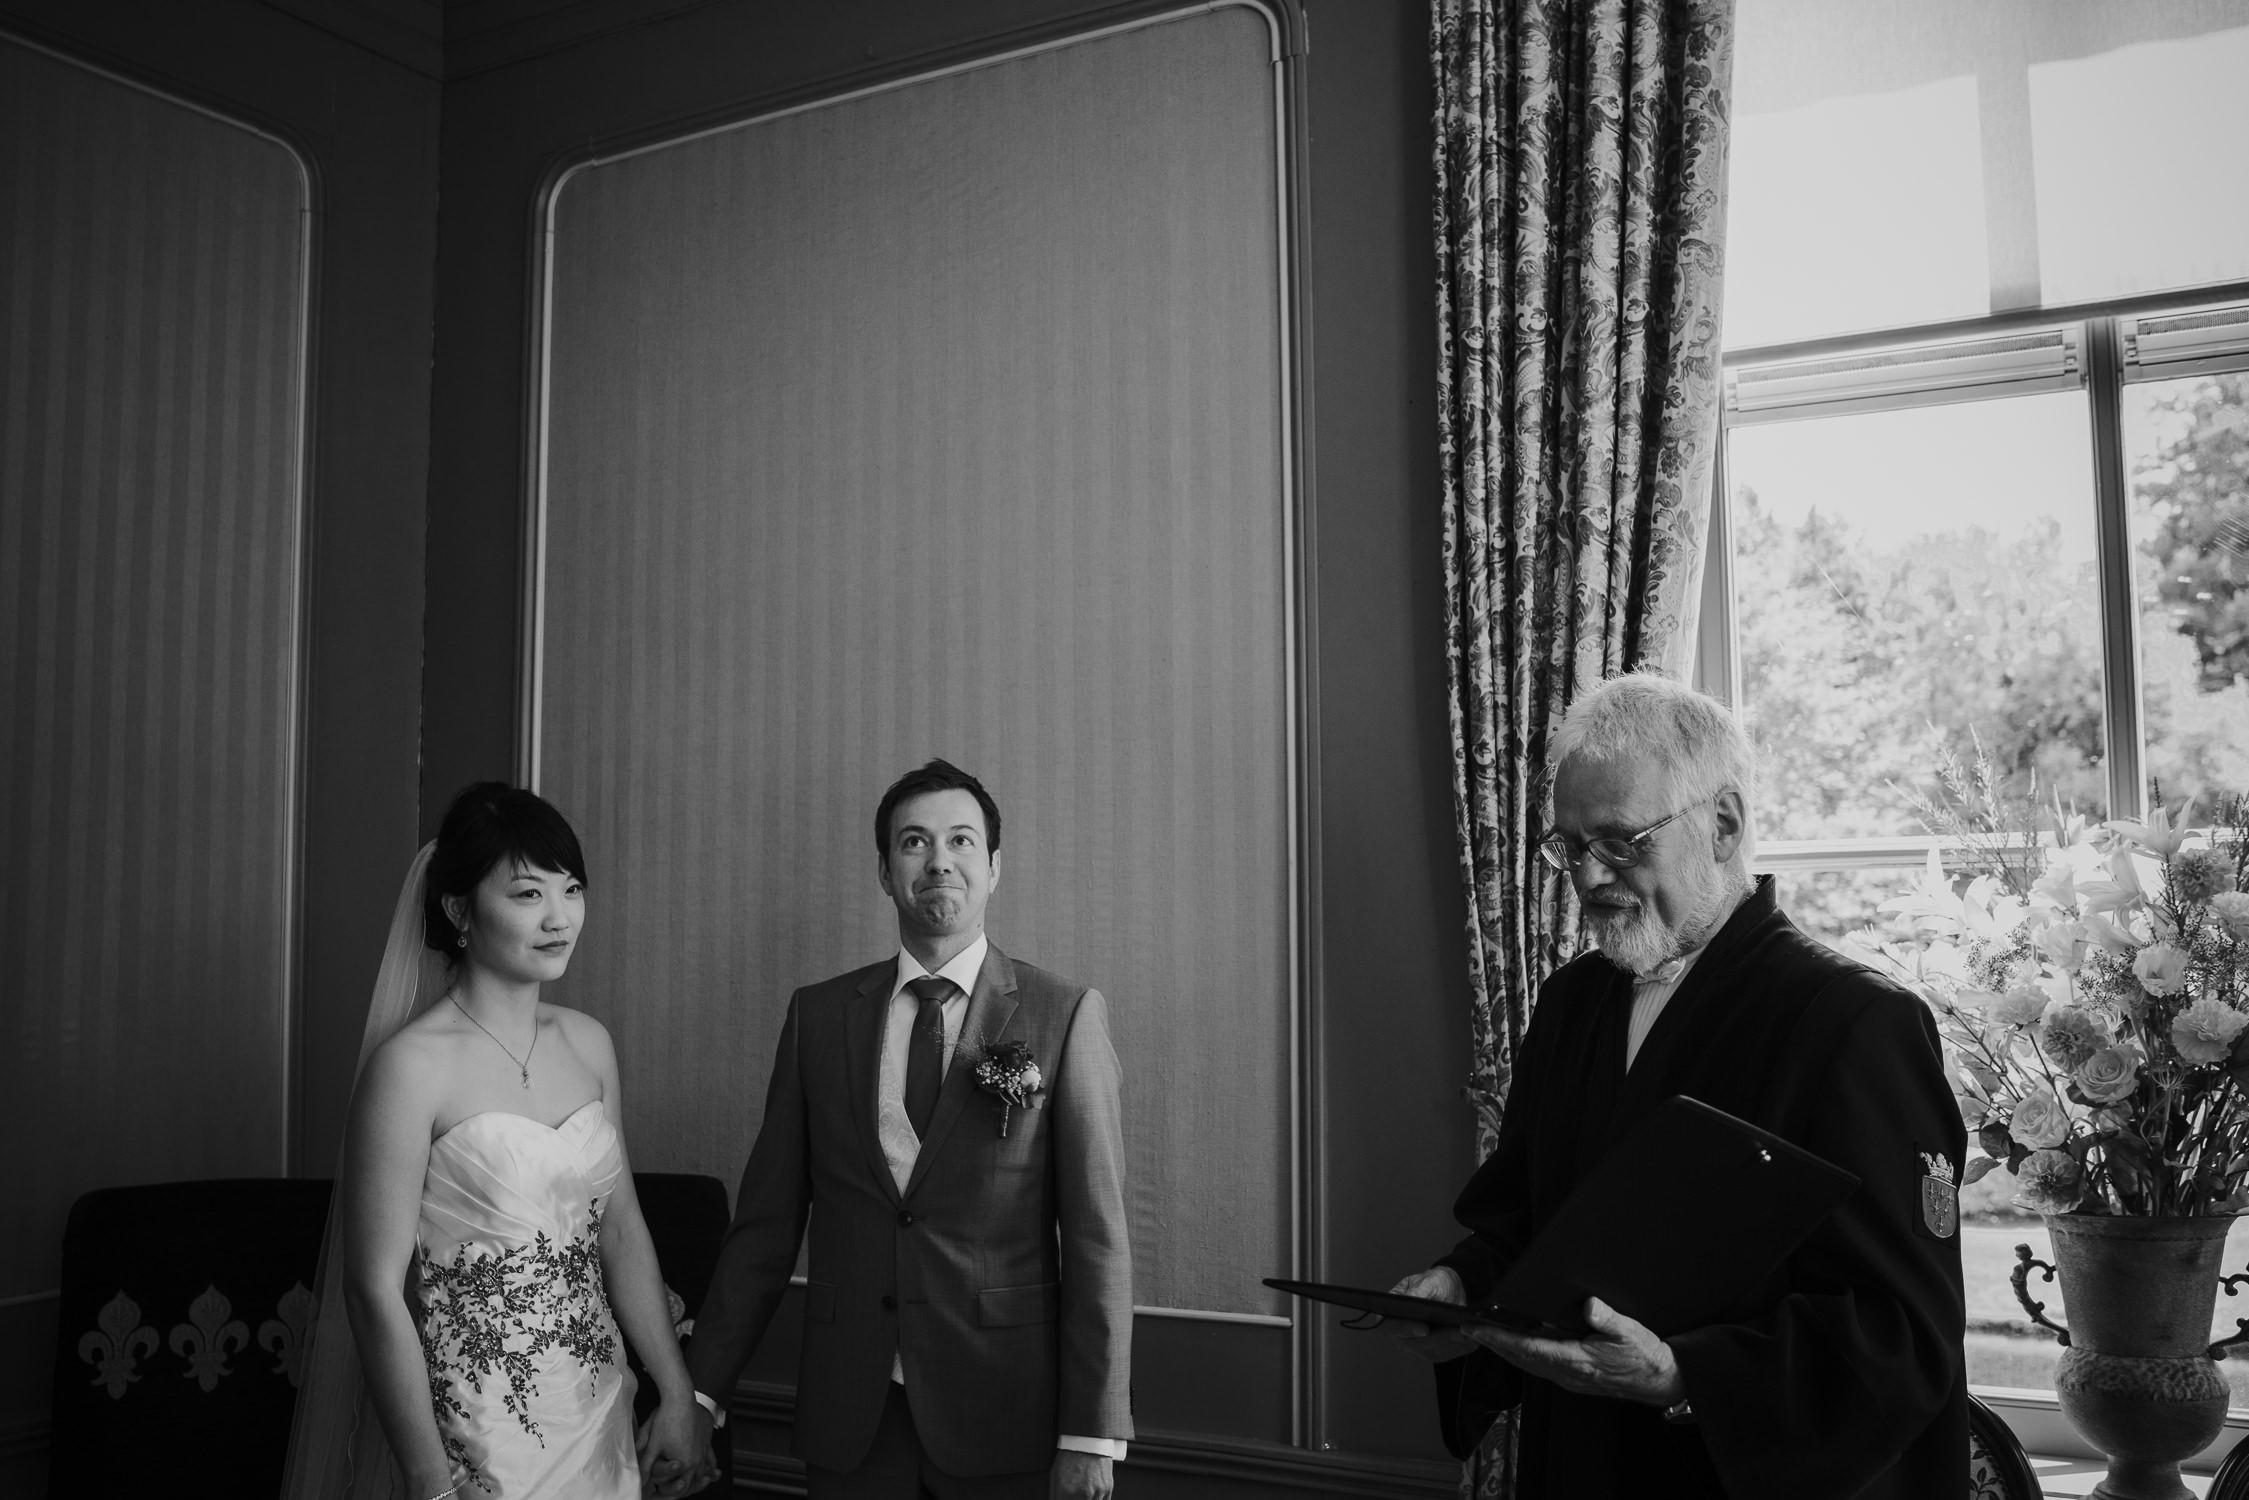 bruidsfotografie-amsterdam-utrecht-trouwfotograaf-mark-hadden-wedding-photography-Yun & Geert-195-2.jpg